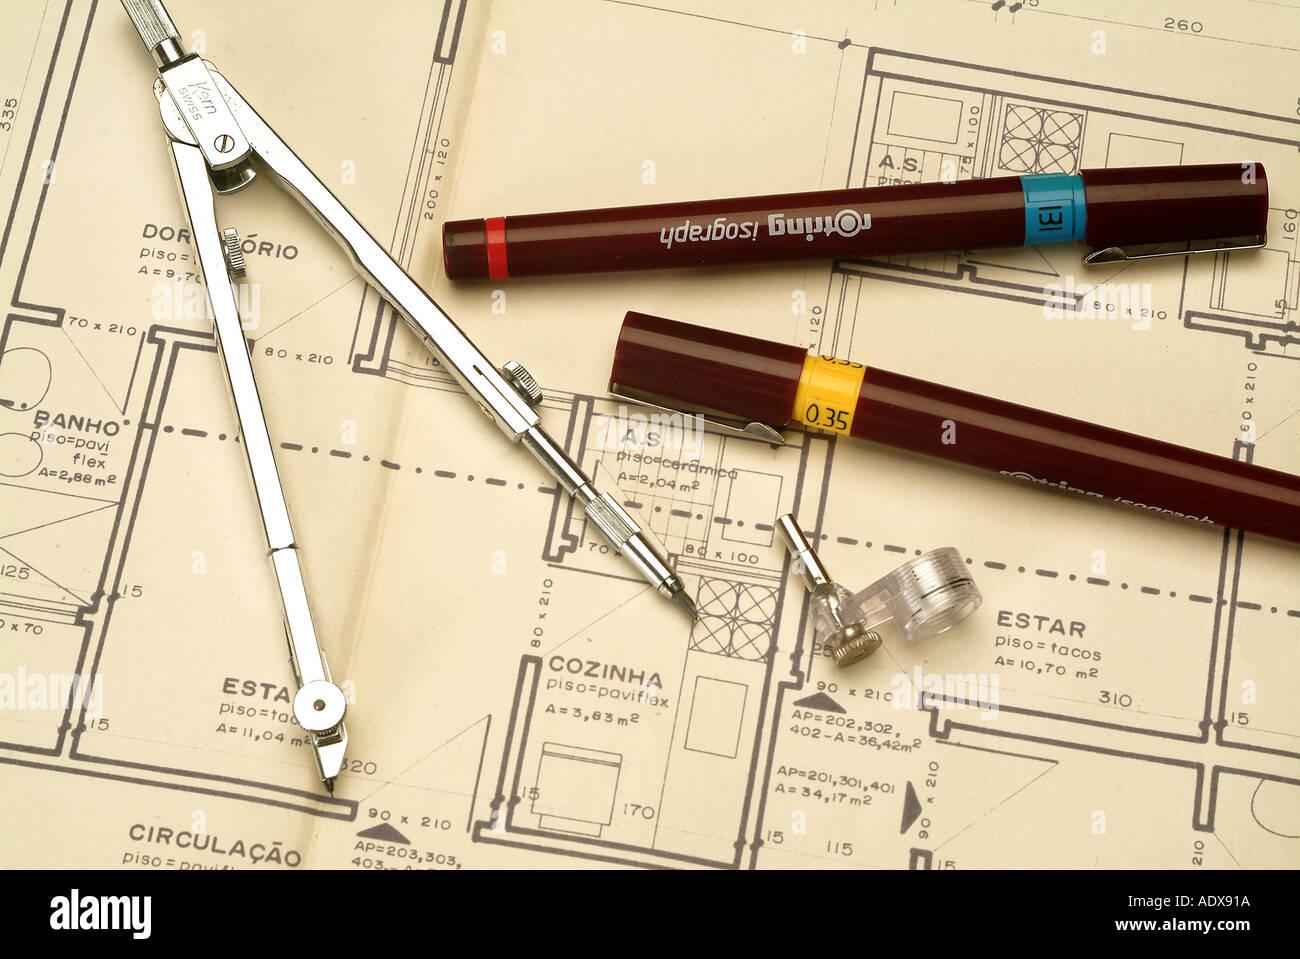 Architecture ink pens concept conceptual compass blueprint diagram architecture ink pens concept conceptual compass blueprint diagram project scheme ruler architecture malvernweather Choice Image